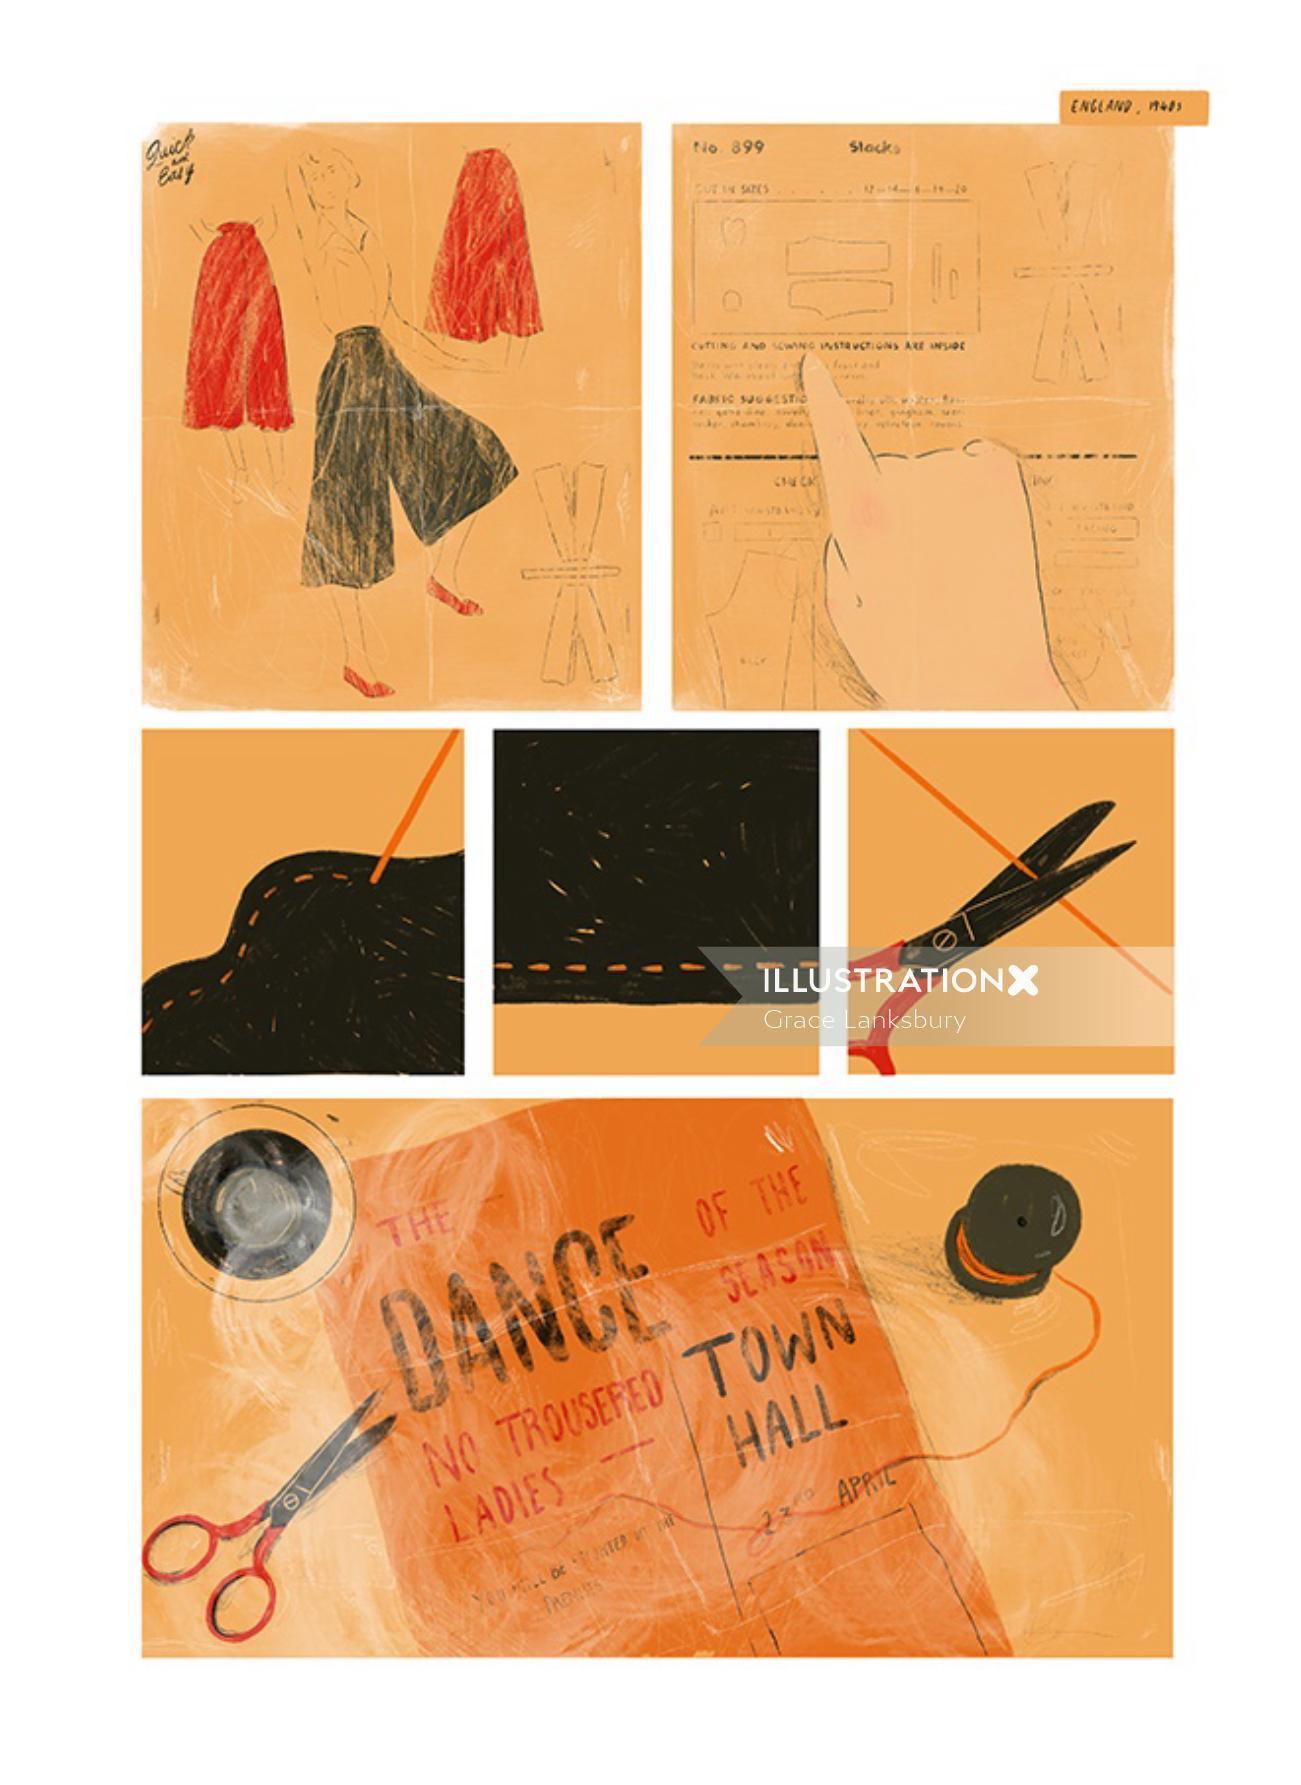 Fashion illustration of fashion design